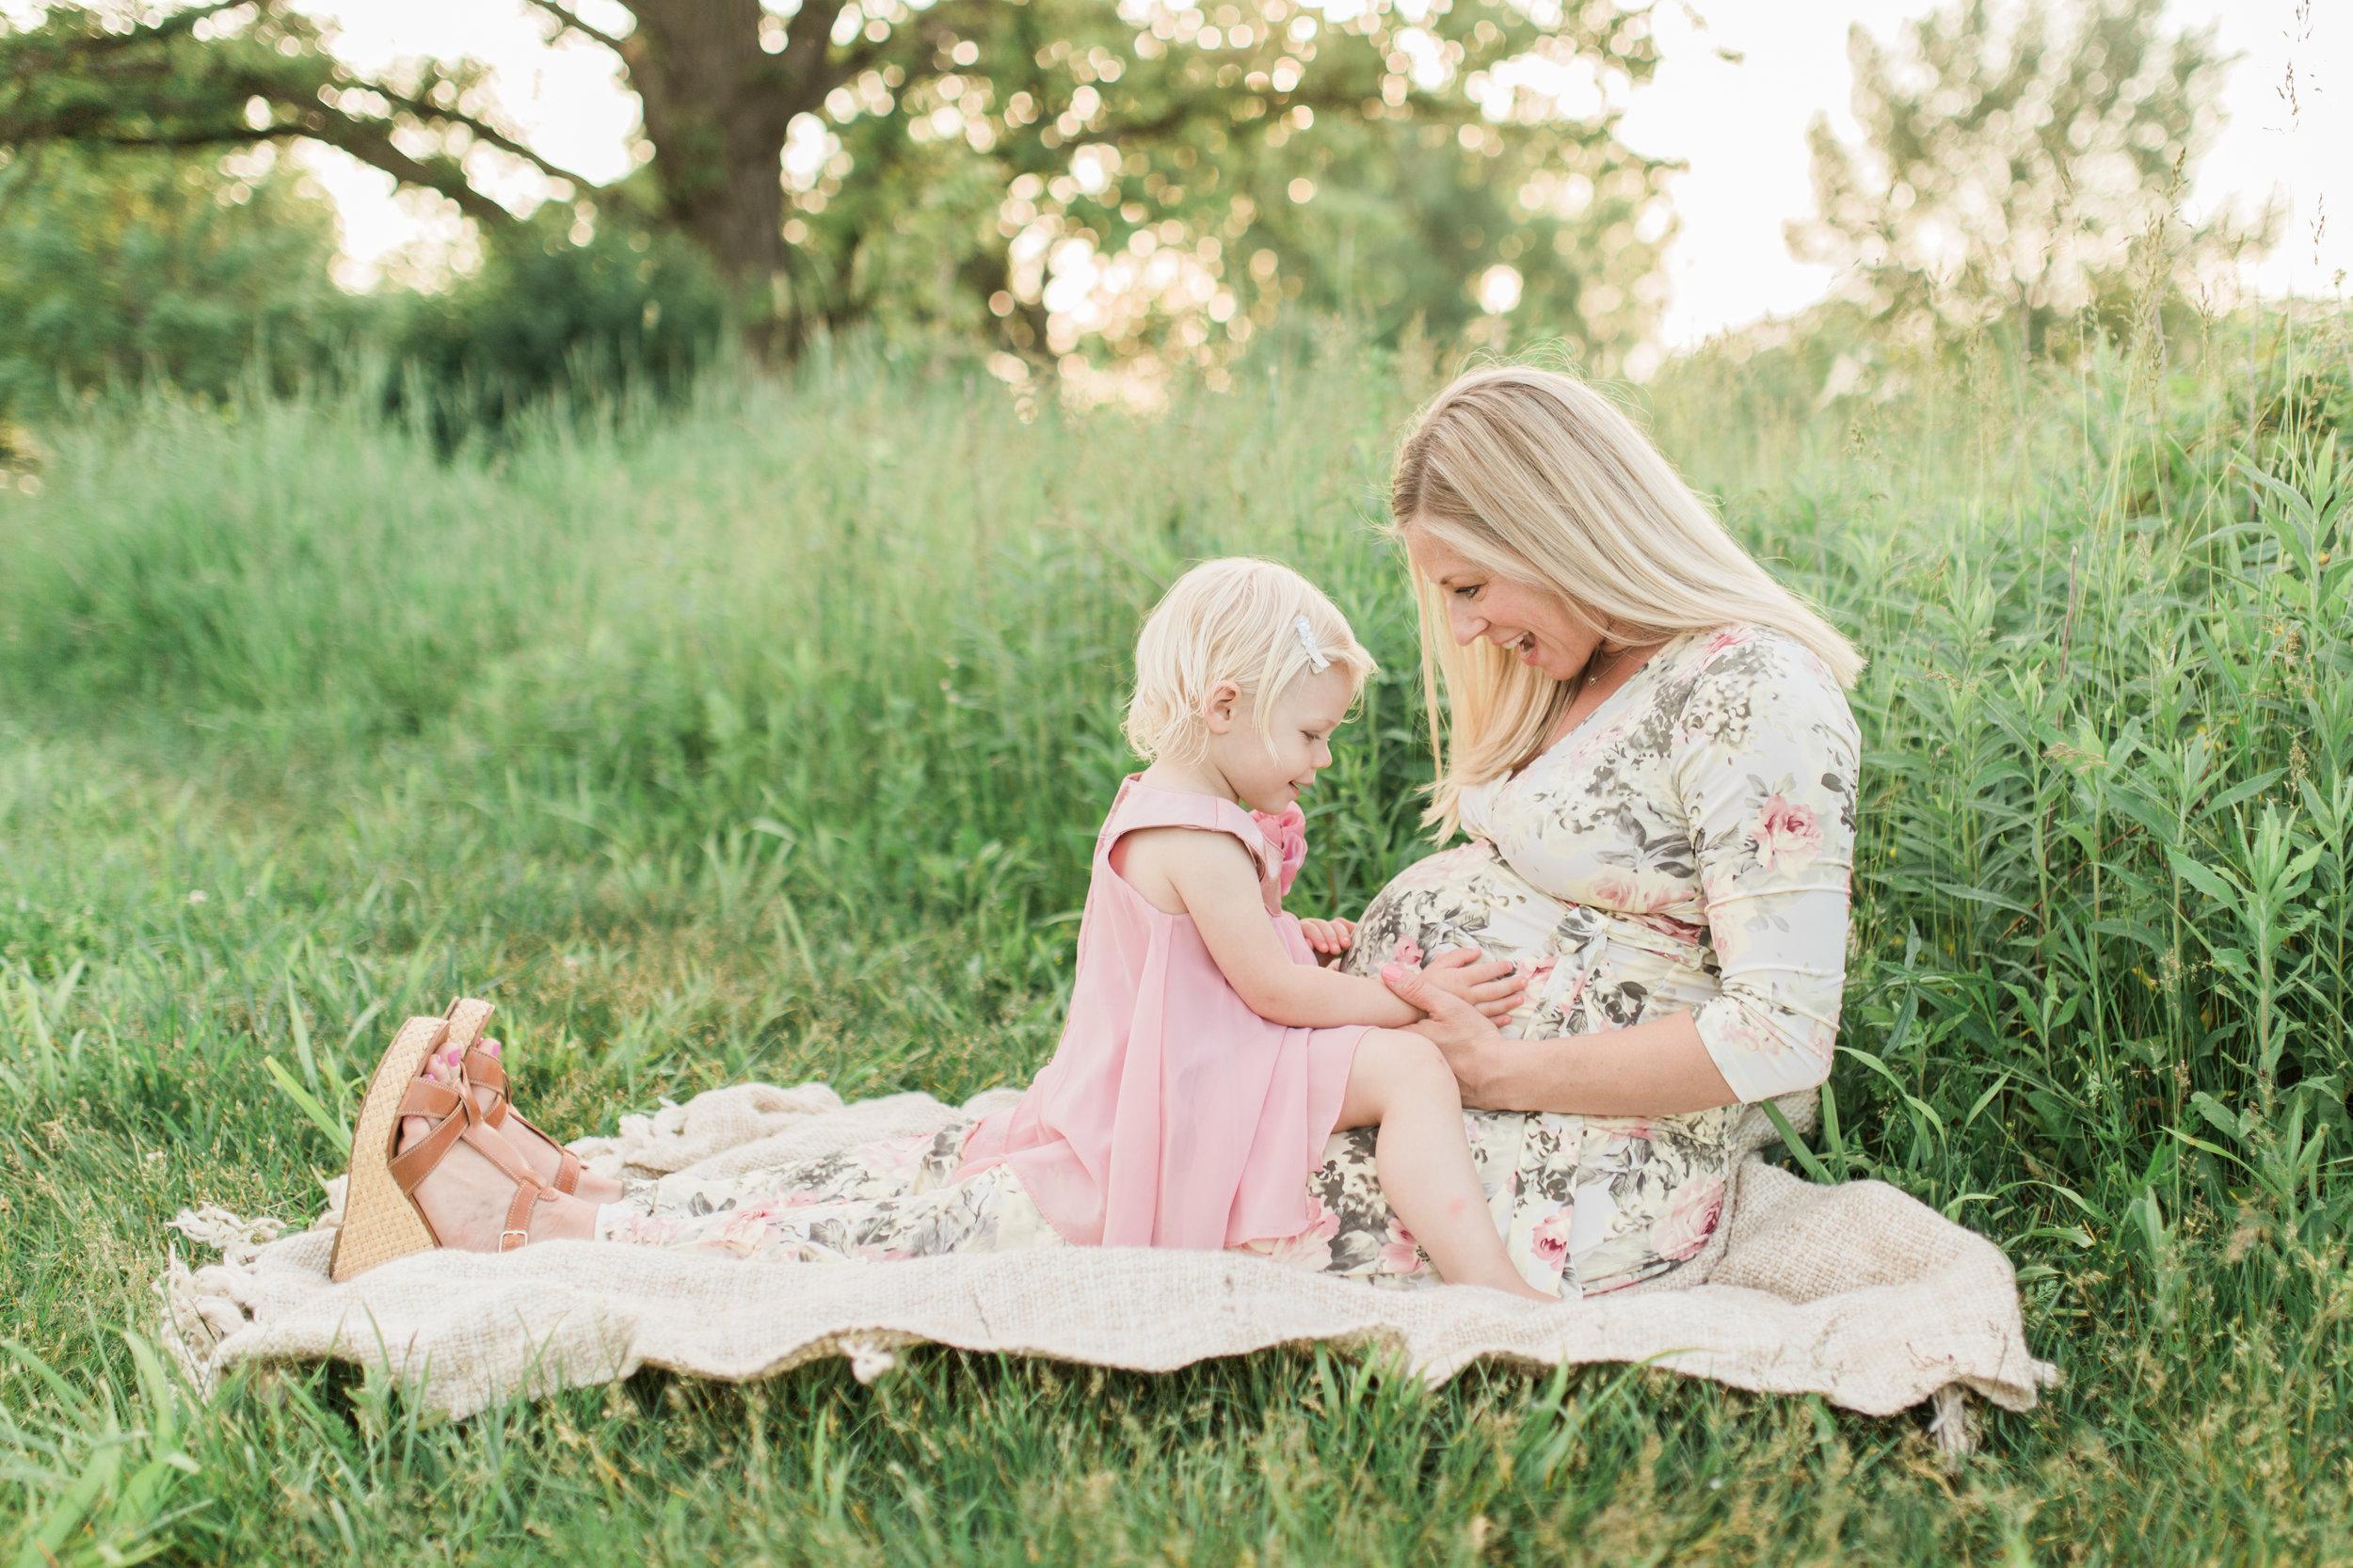 Thoele-Maternity-103.jpg